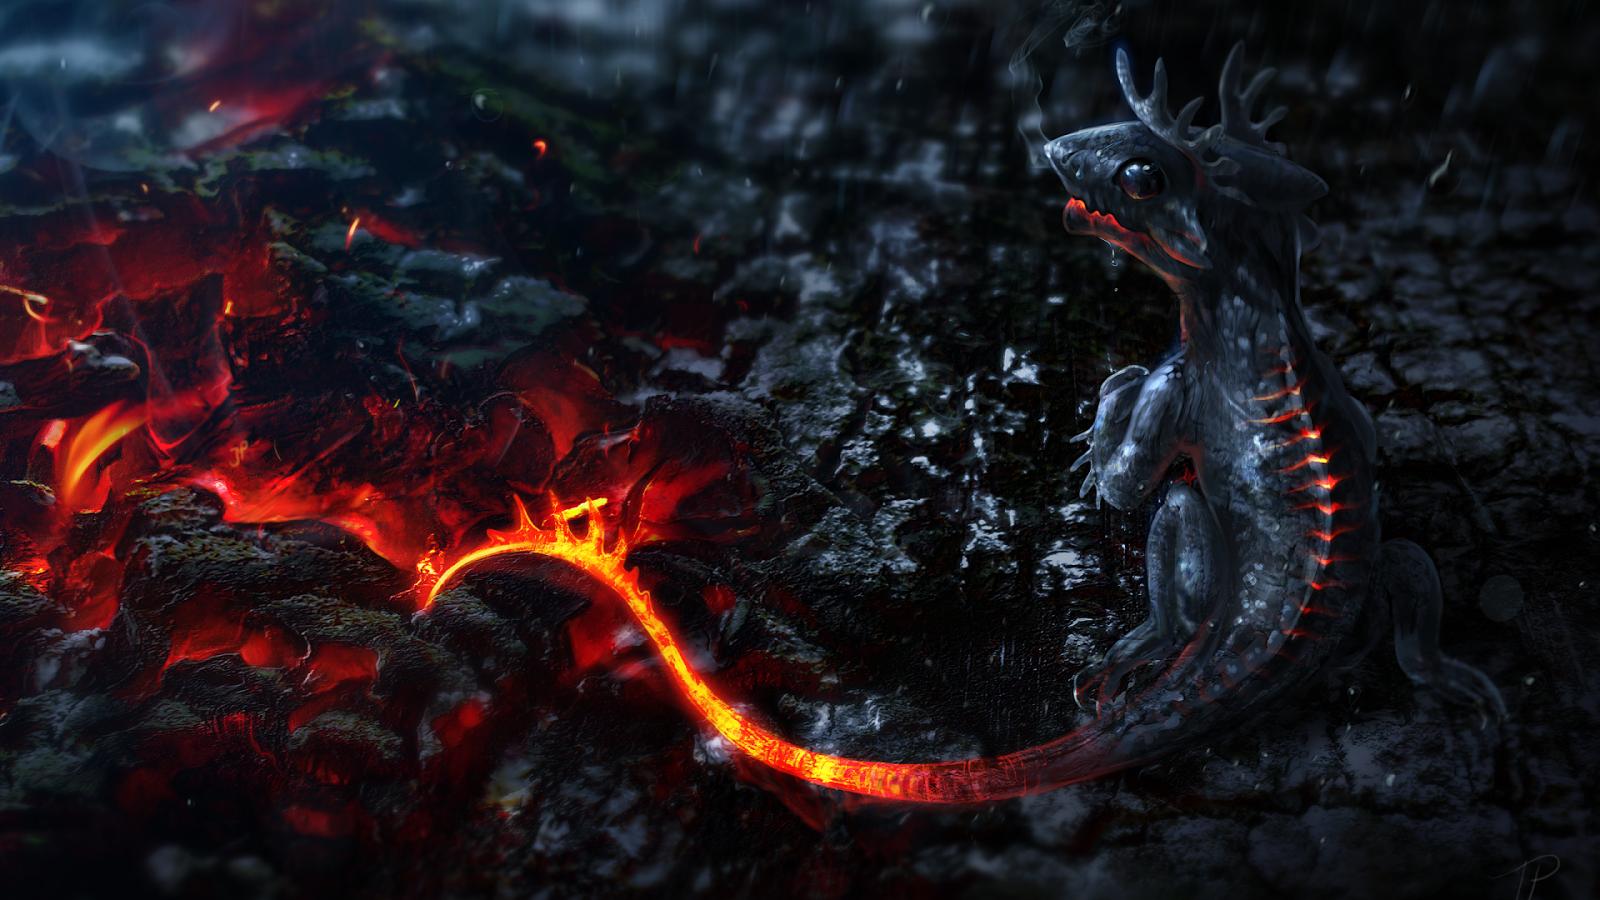 HD Wallpapers 1080P Little dragon 3D 1600x900